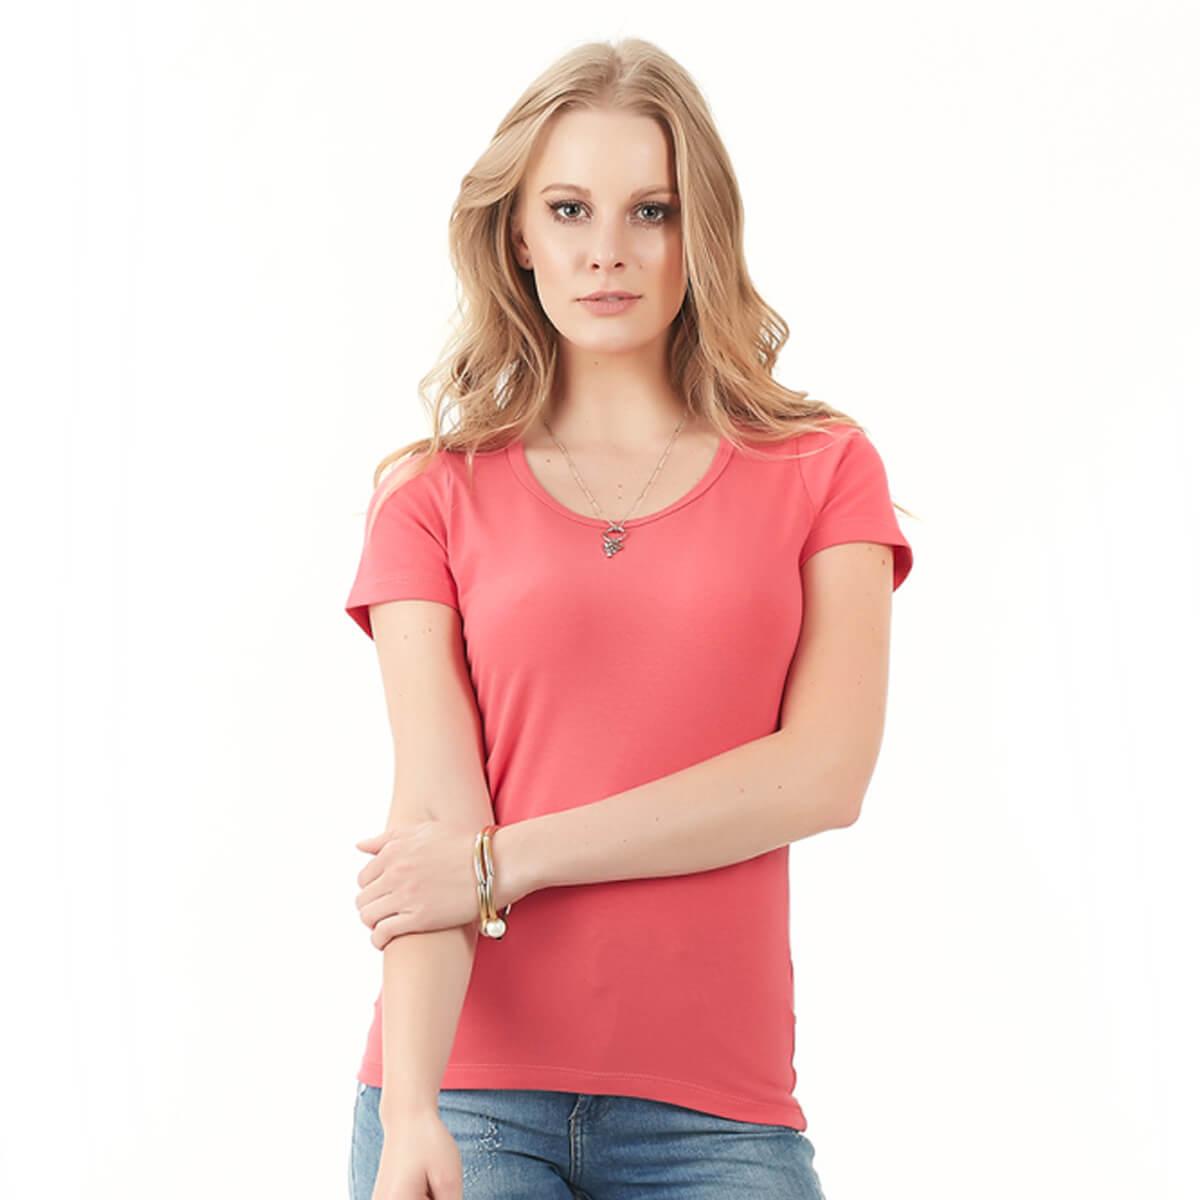 Blusa Feminina Básica Comfort Coral